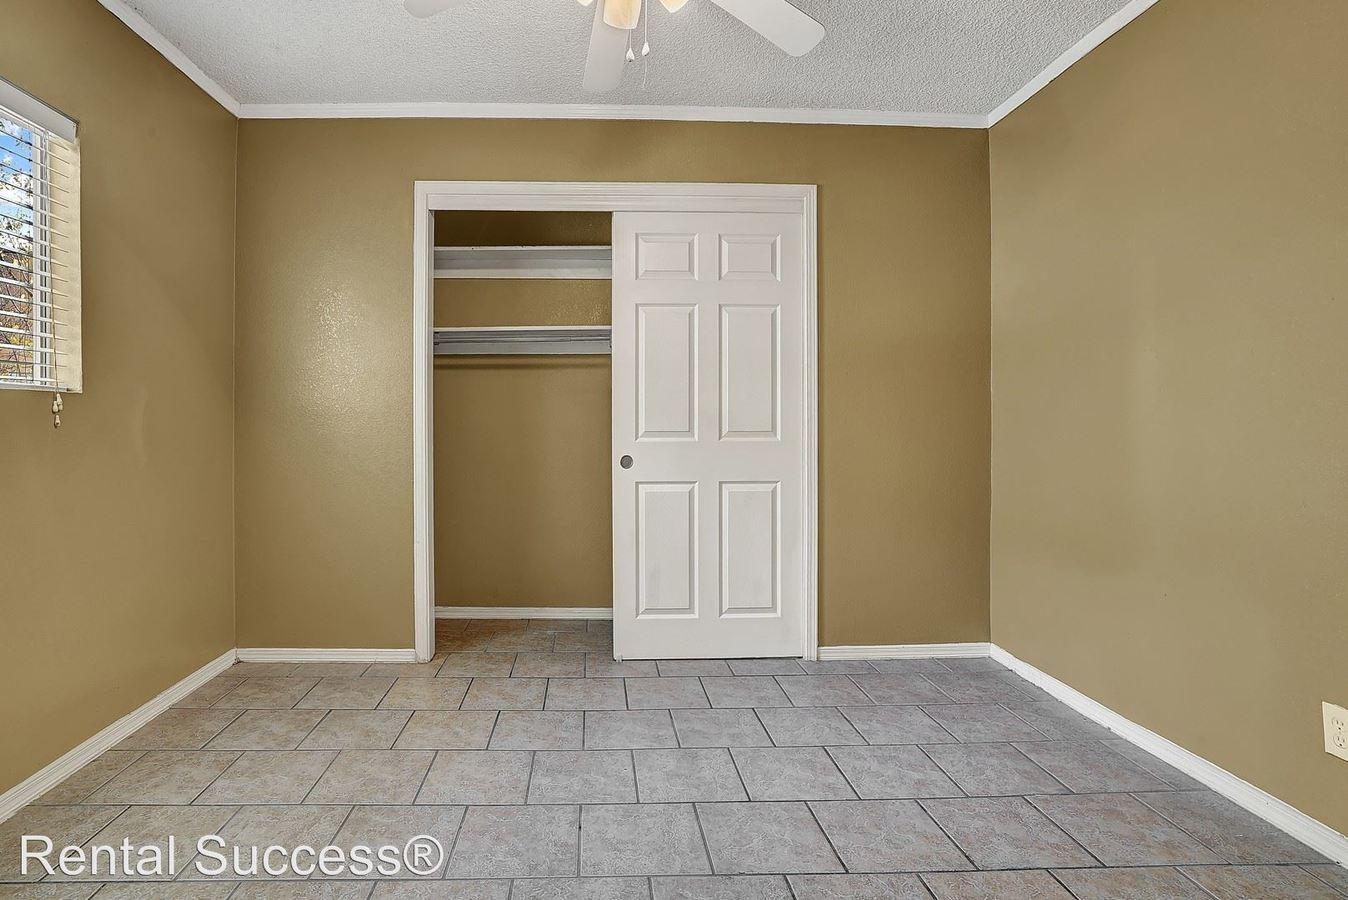 2 Bedrooms 1 Bathroom Apartment for rent at 7917 San Jose Road in El Paso, TX